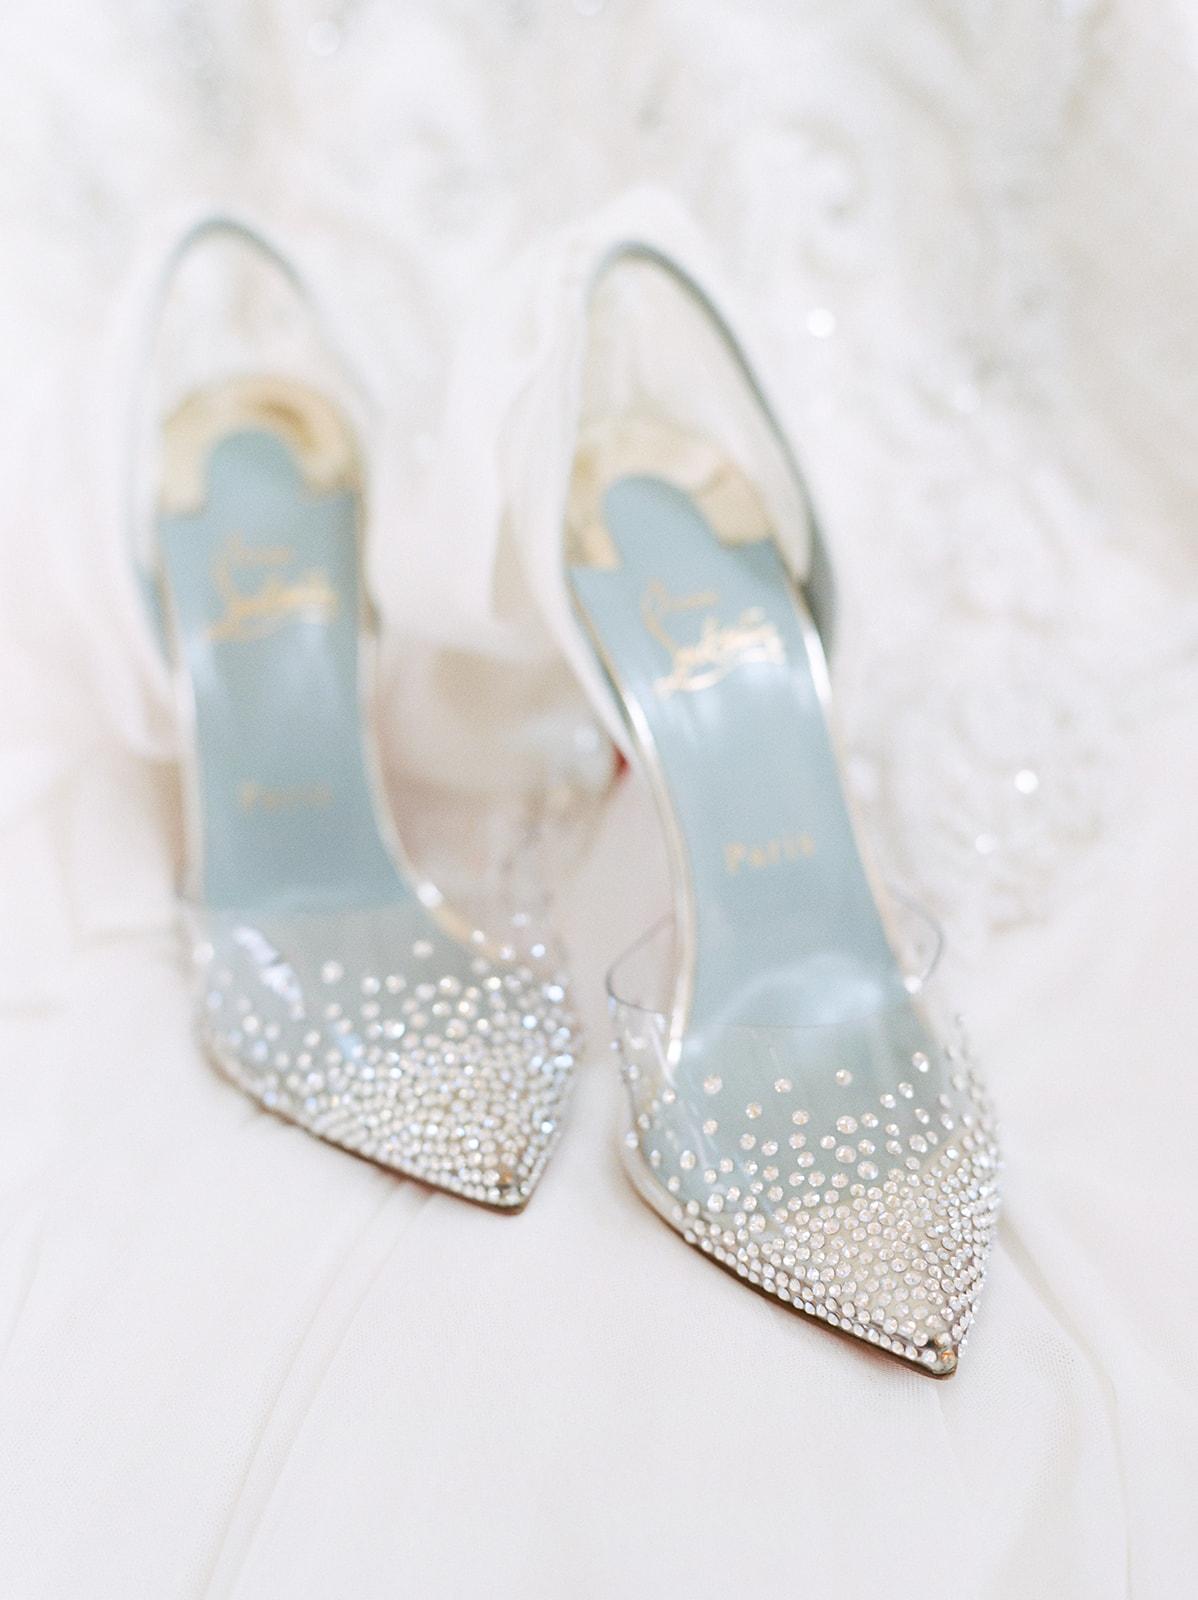 Louis Vuitton Bridal Shoes: Luxurious Knotting Hill Place Wedding